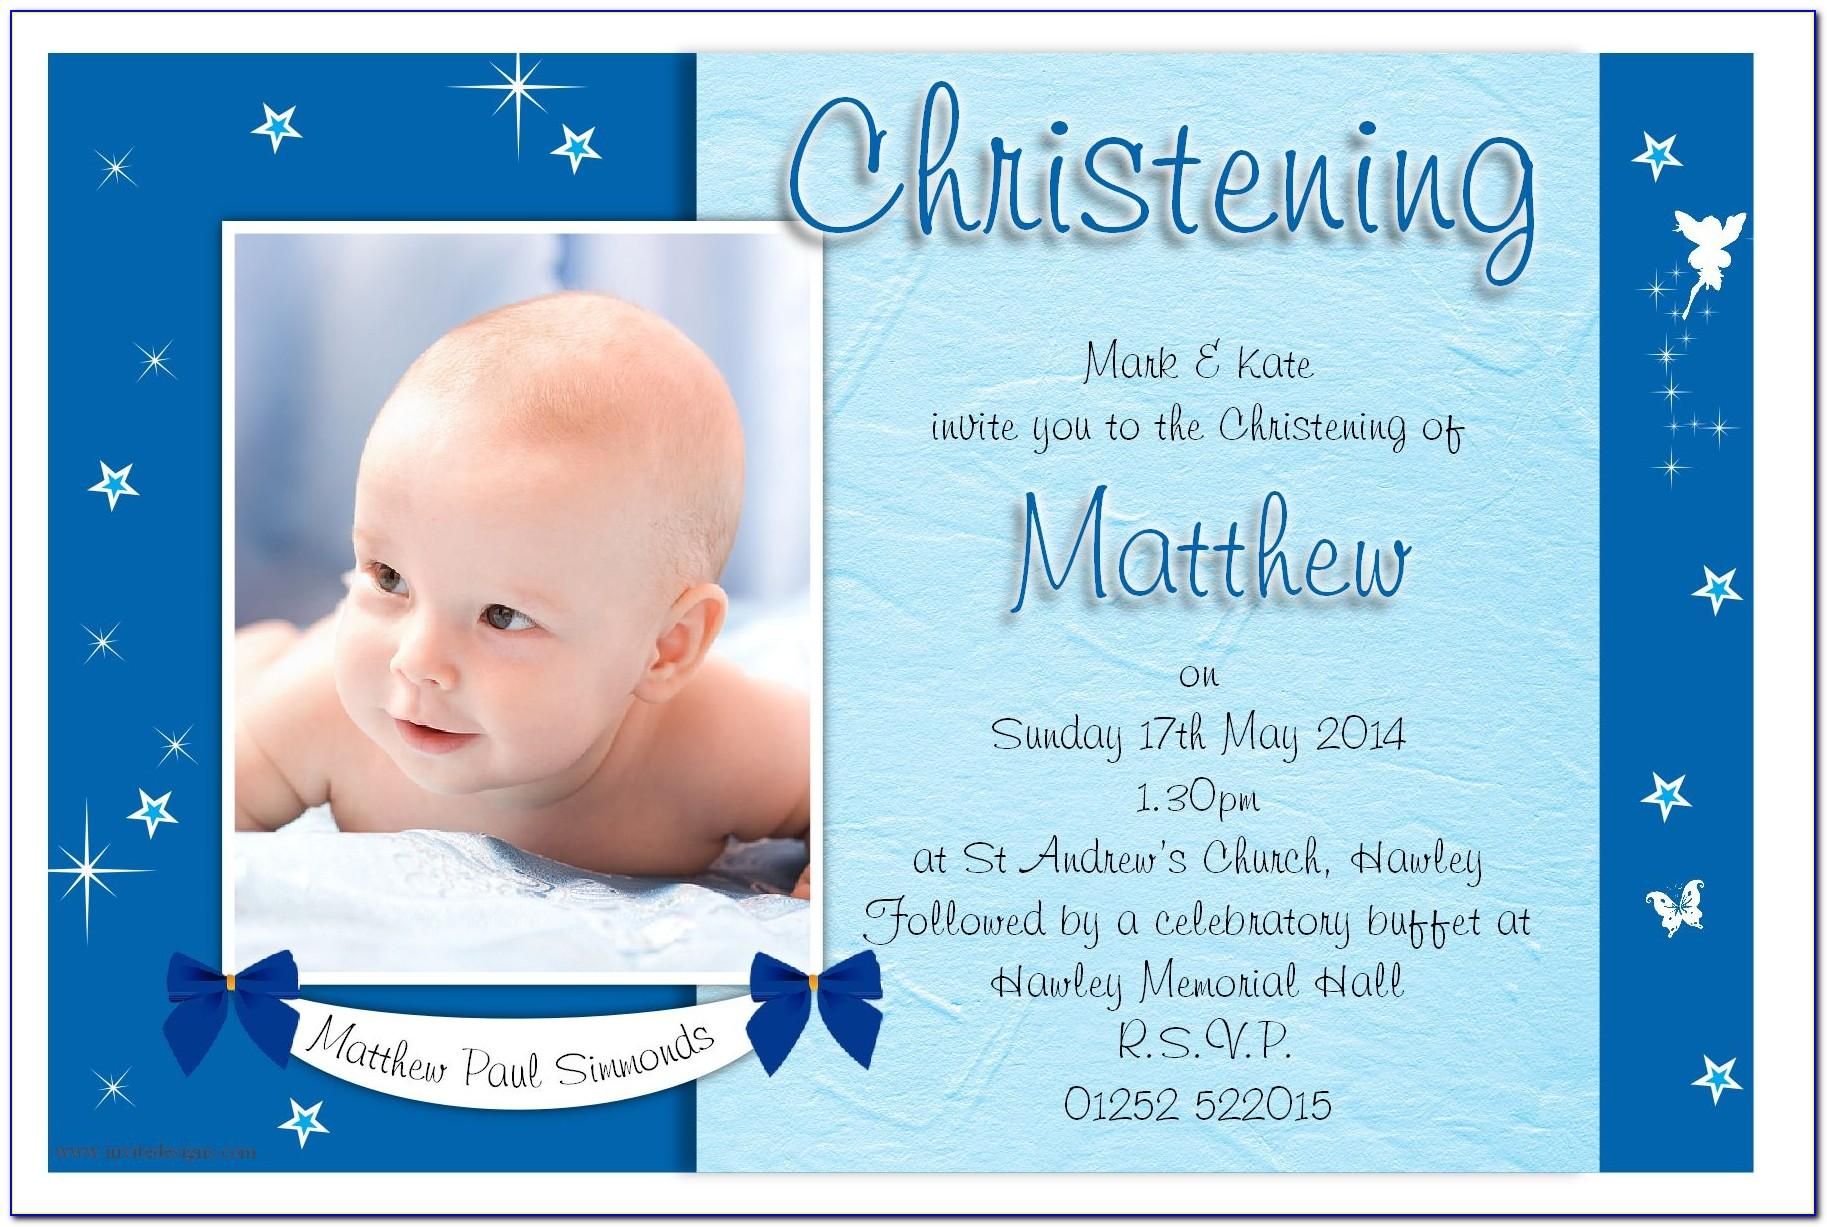 Invitation Designs For Baptism